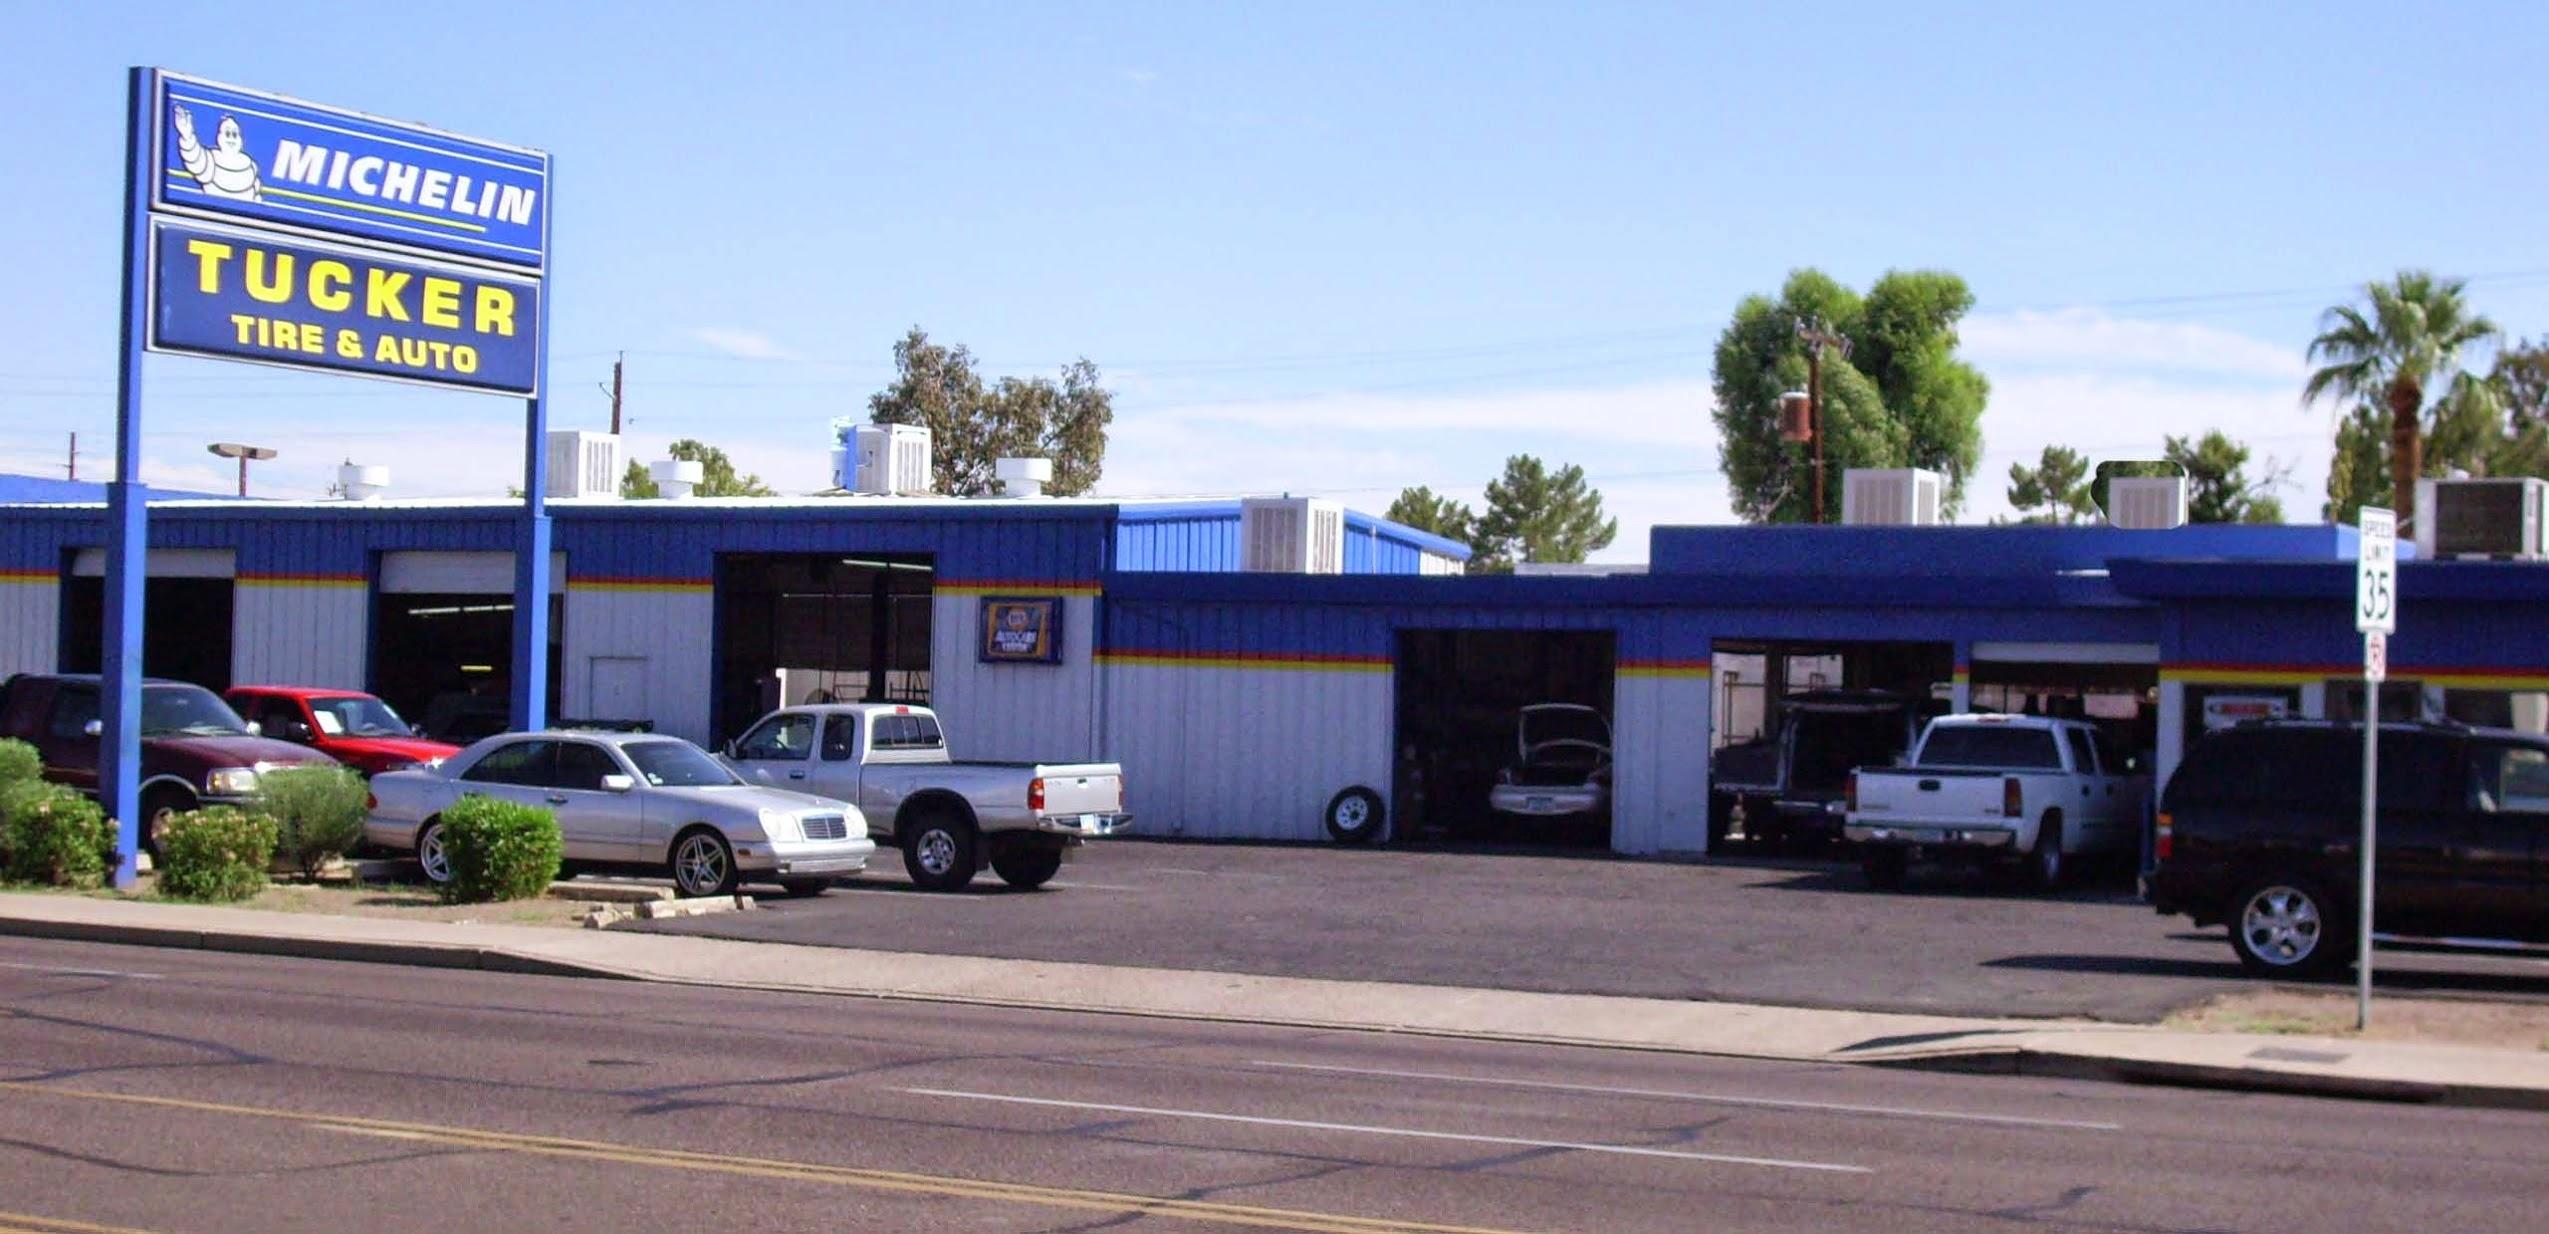 Tucker Tire Amp Auto Phoenix Arizona Az Localdatabase Com